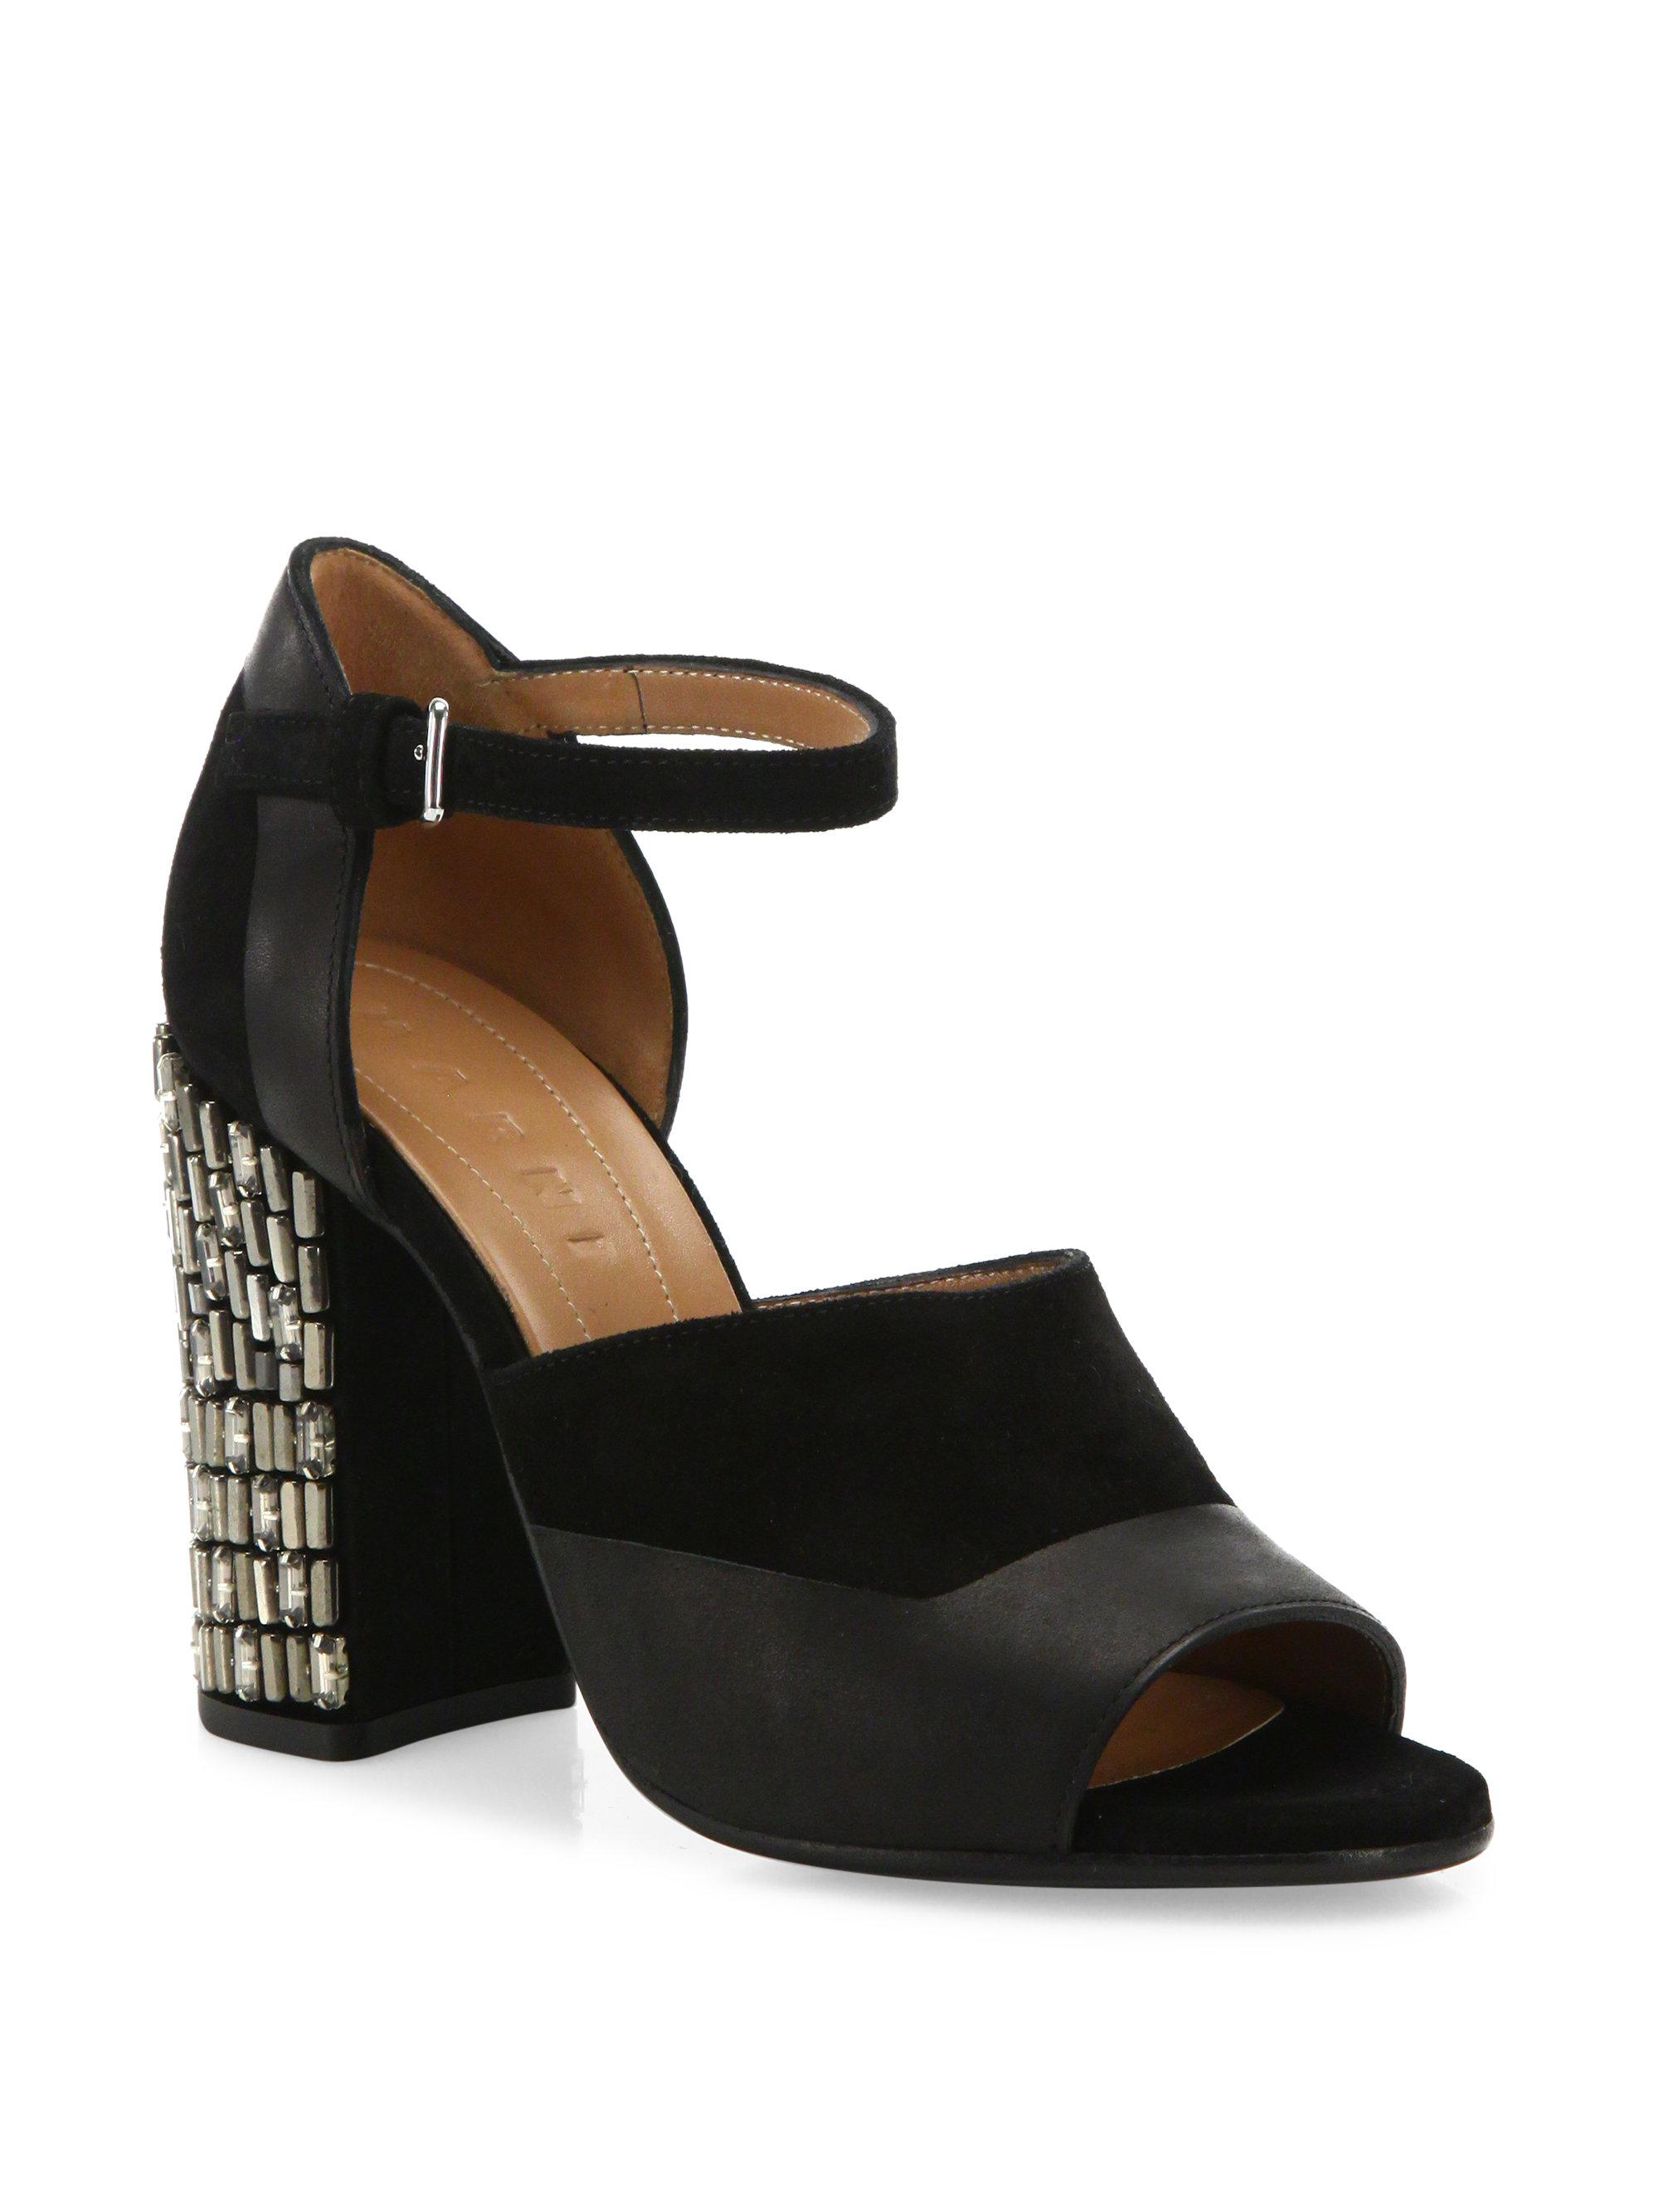 sale deals discount best prices Marni Embellished Ankle-Strap Pumps outlet cheap online cheap fashionable lnqUJgmXv8